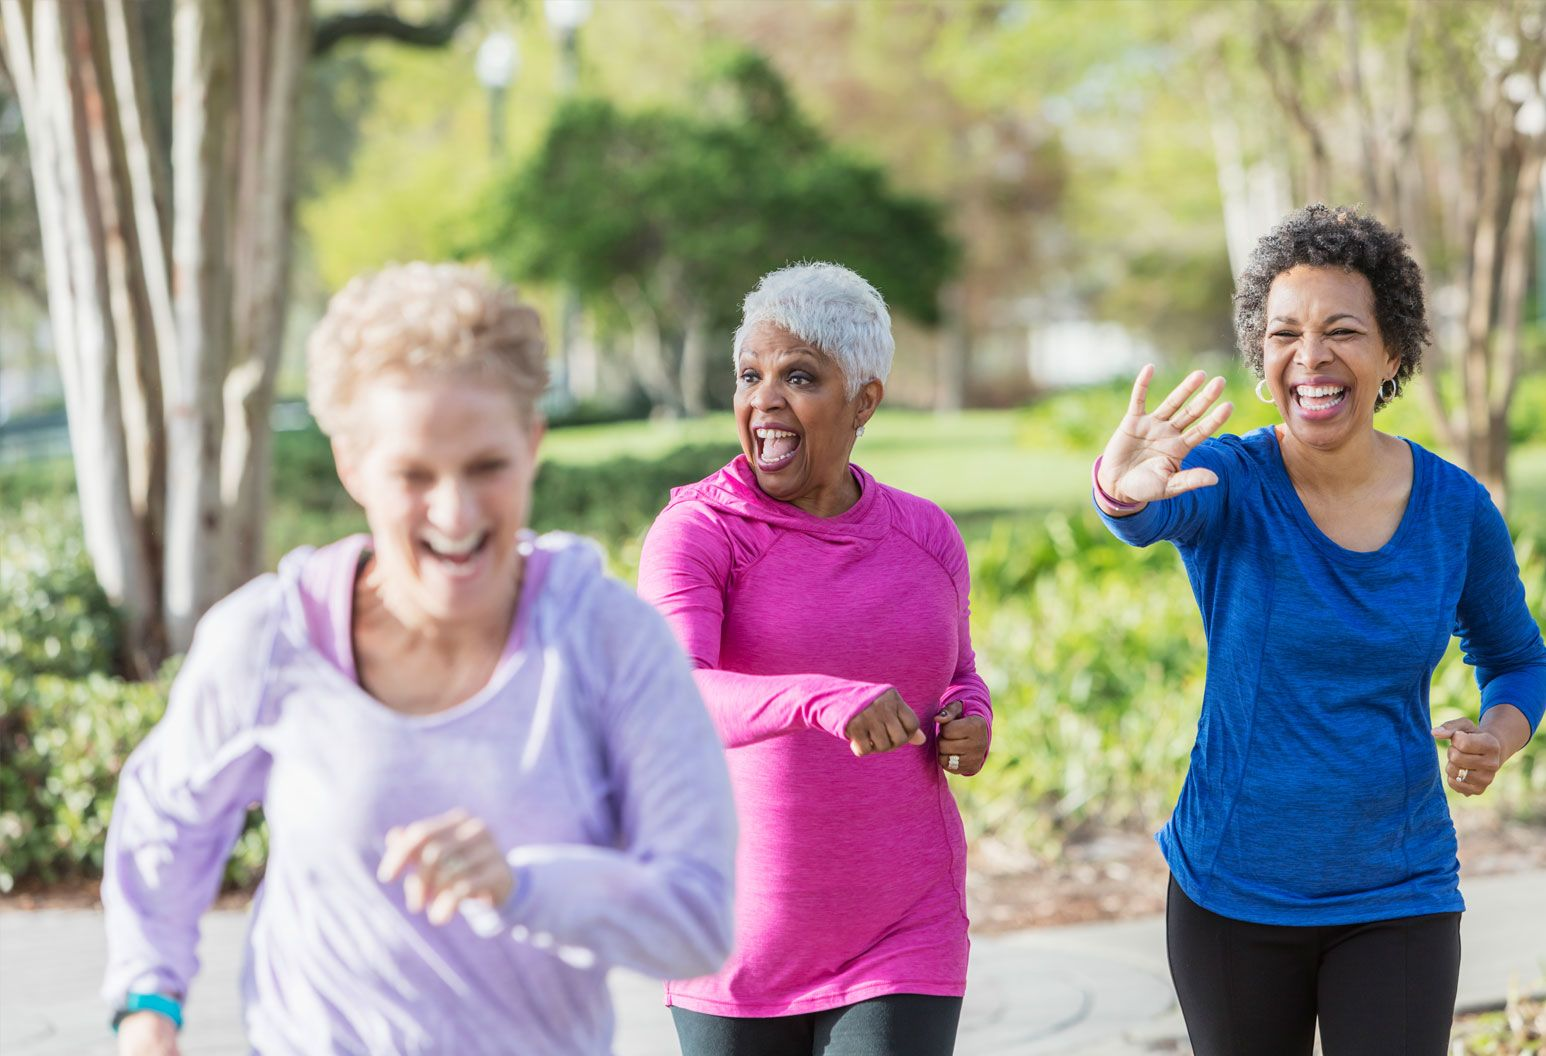 A group of older, diverse women walk through the park.